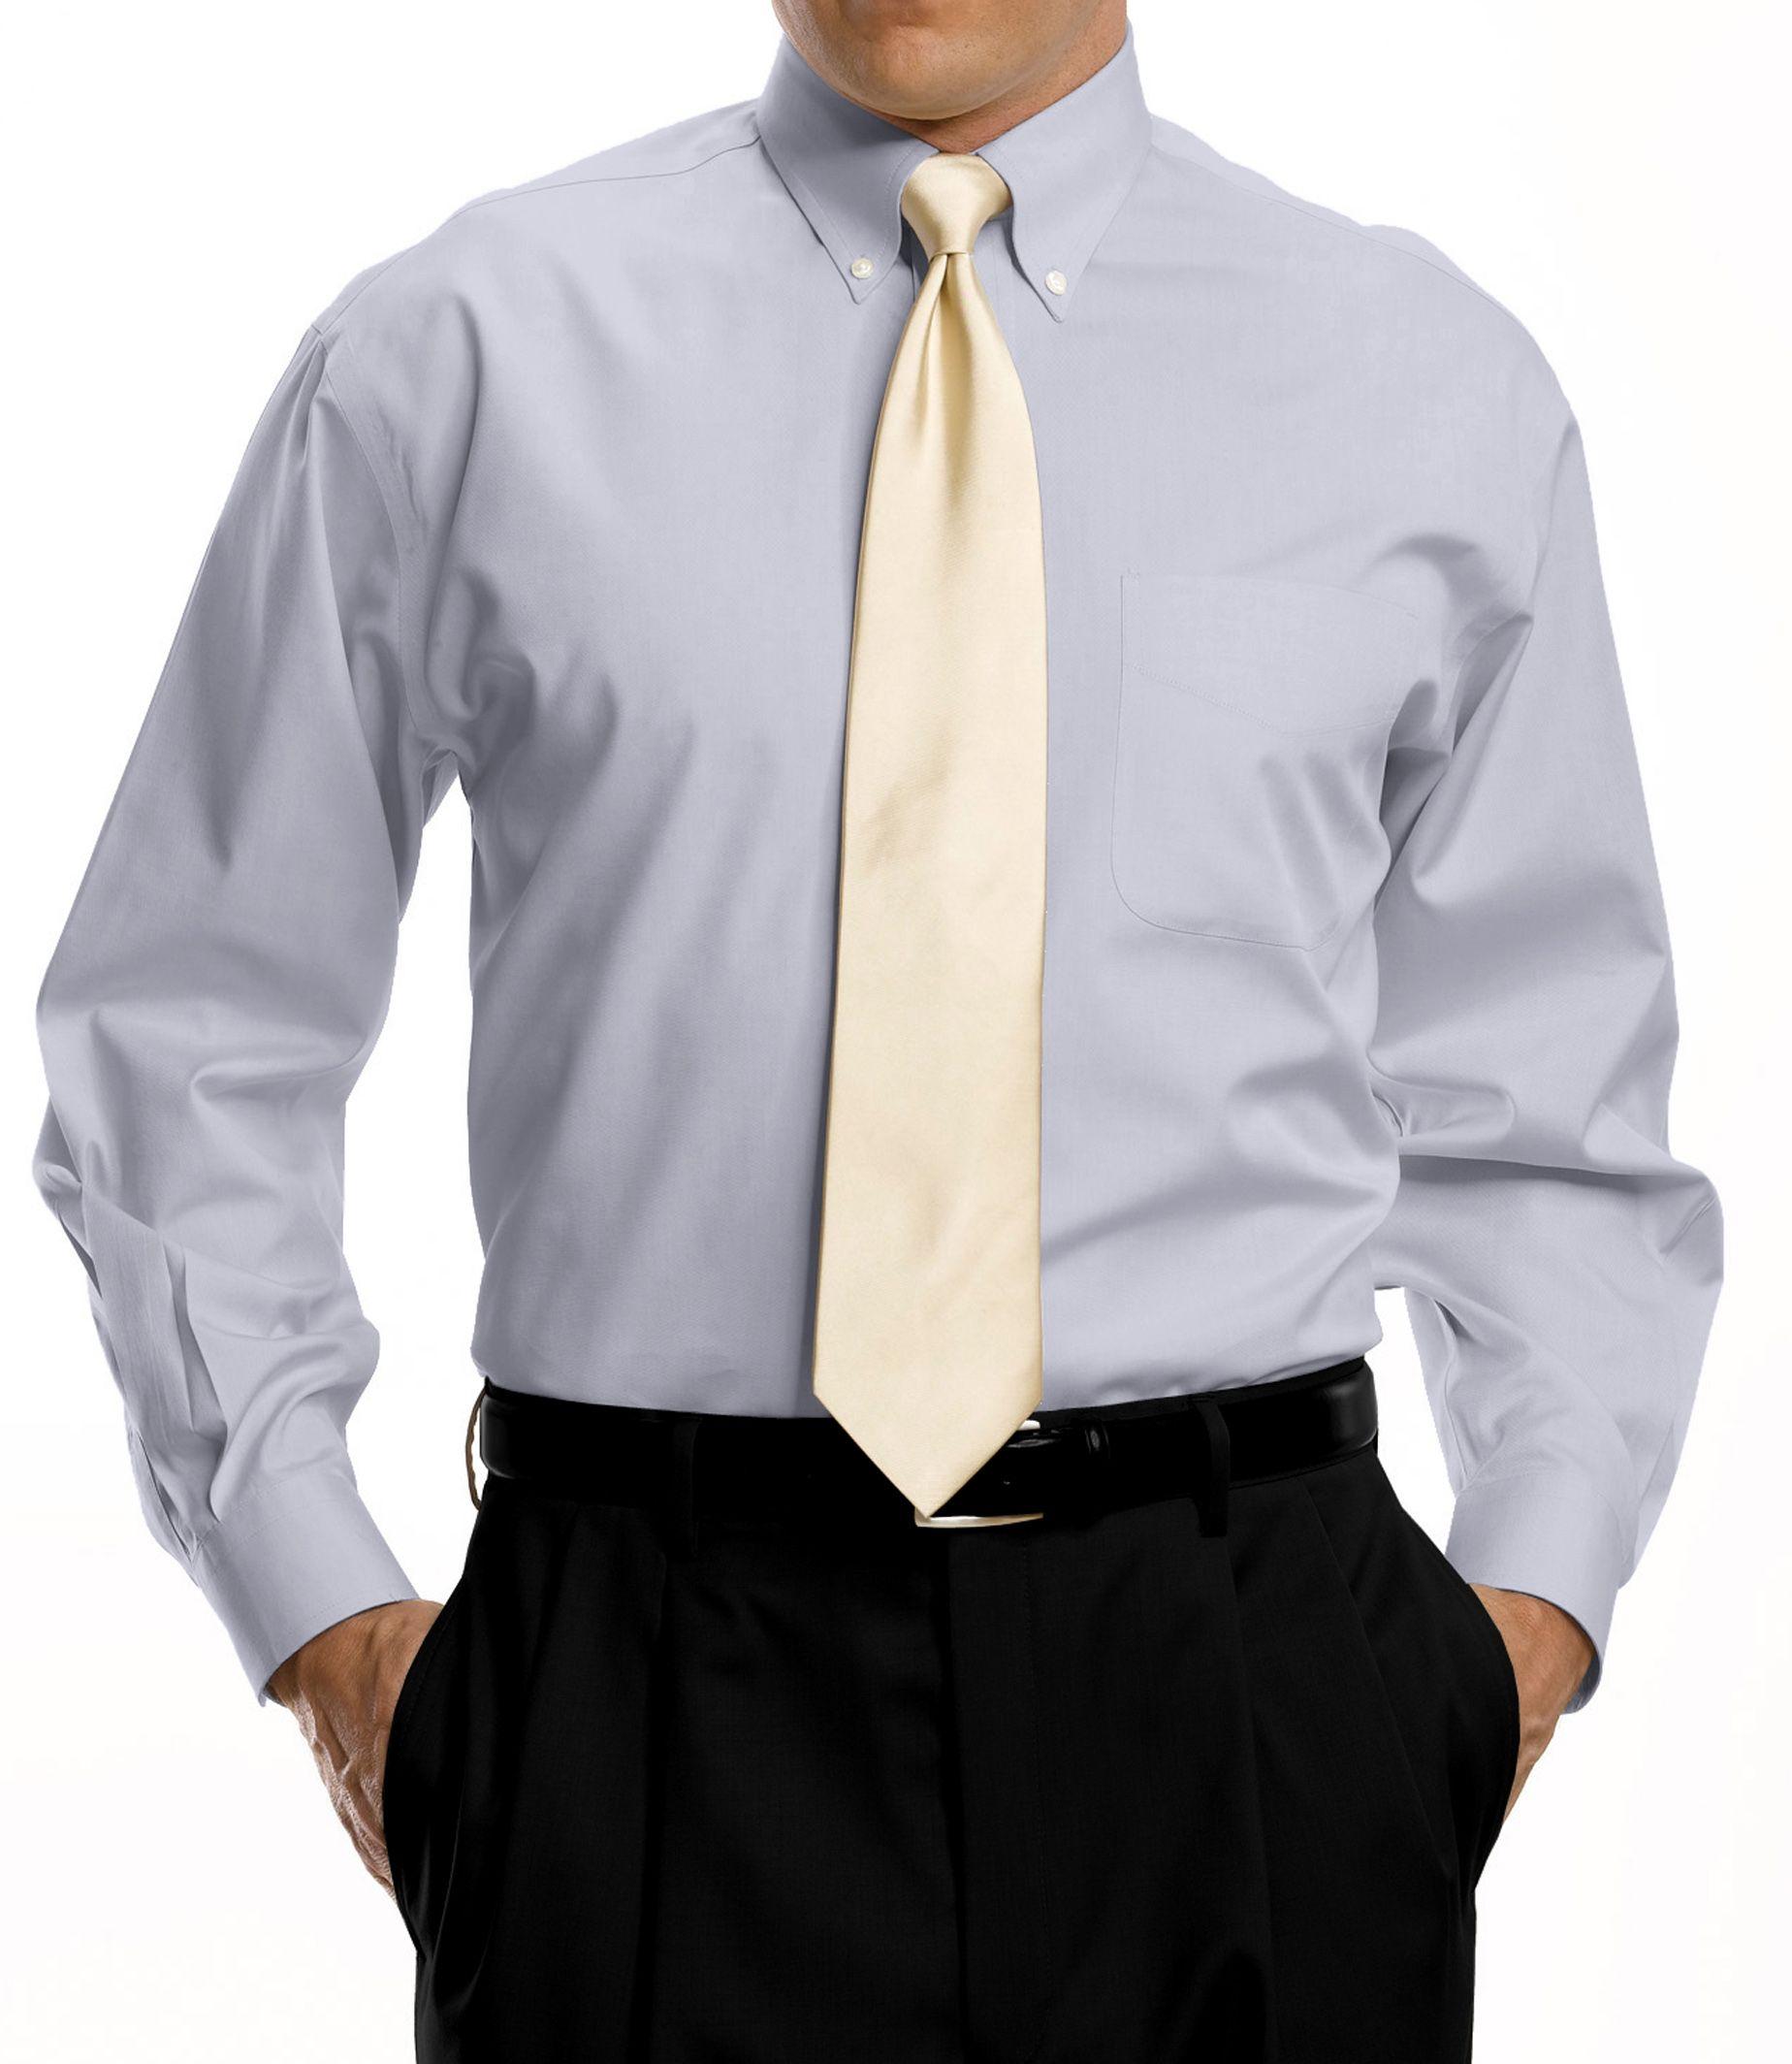 Men's Big & Tall Traditional Fit Dress Shirts | JoS. A. Bank